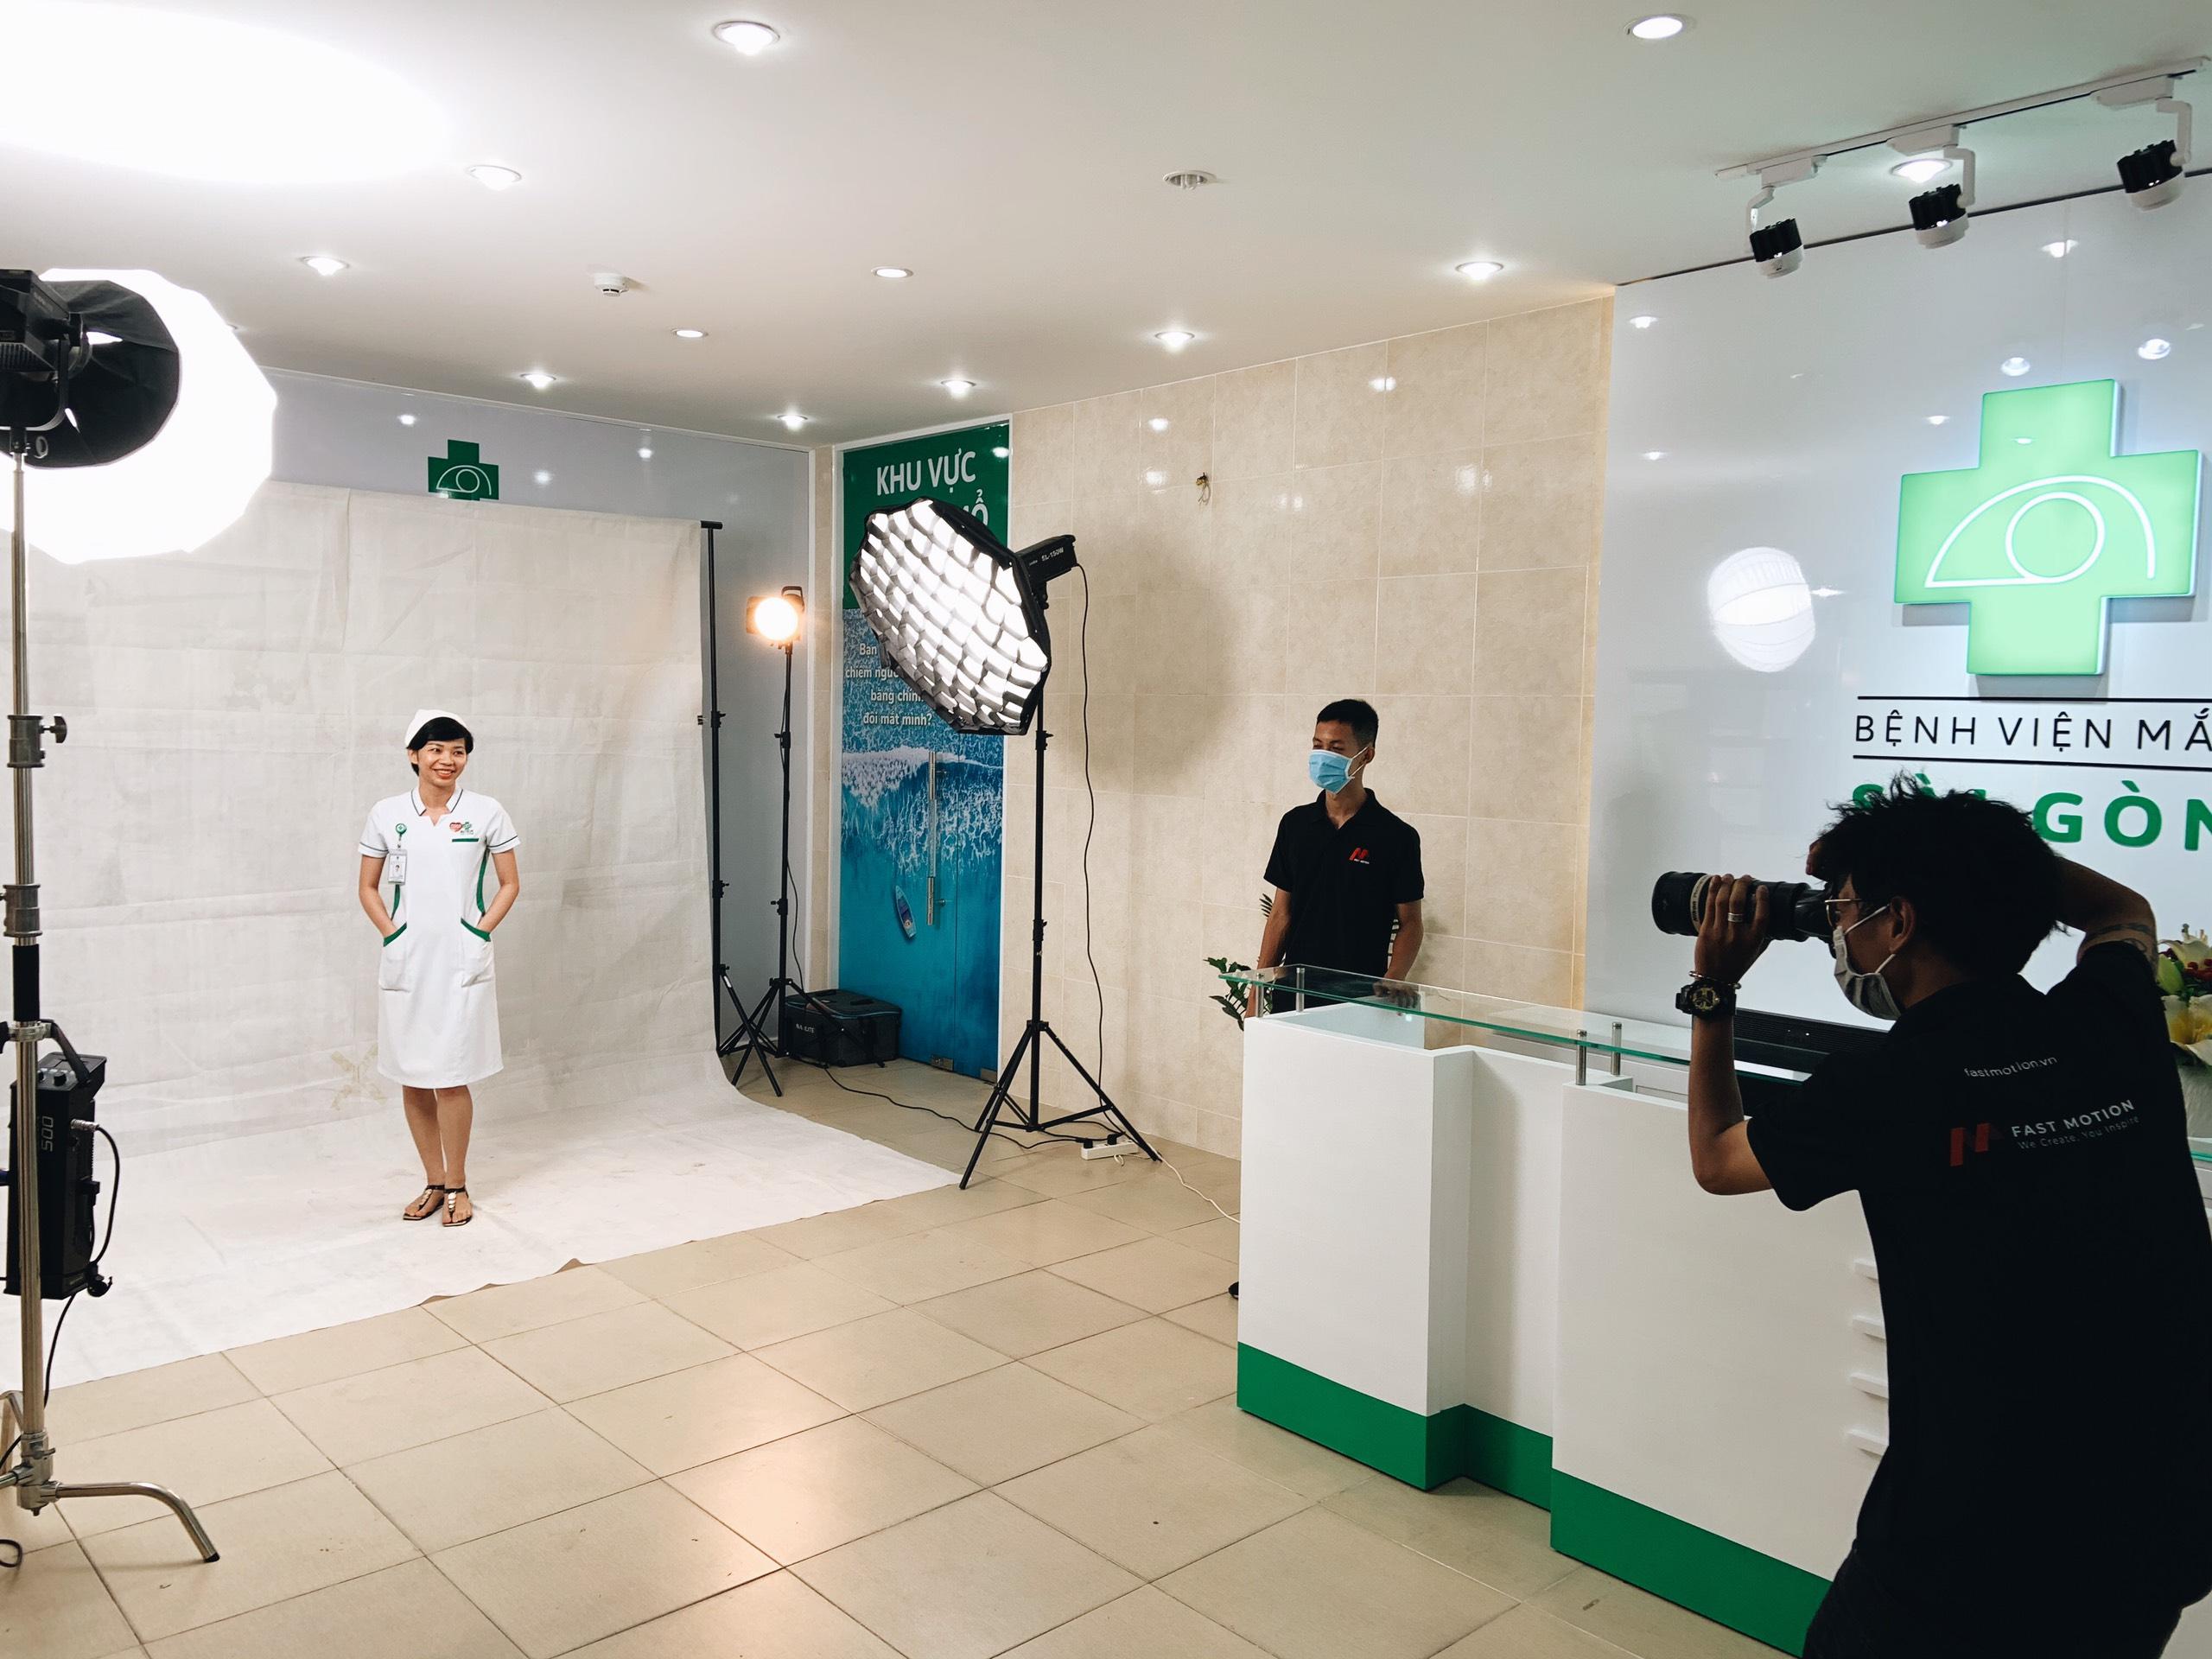 fastmotion chụp ảnh profile doanh nghiệp